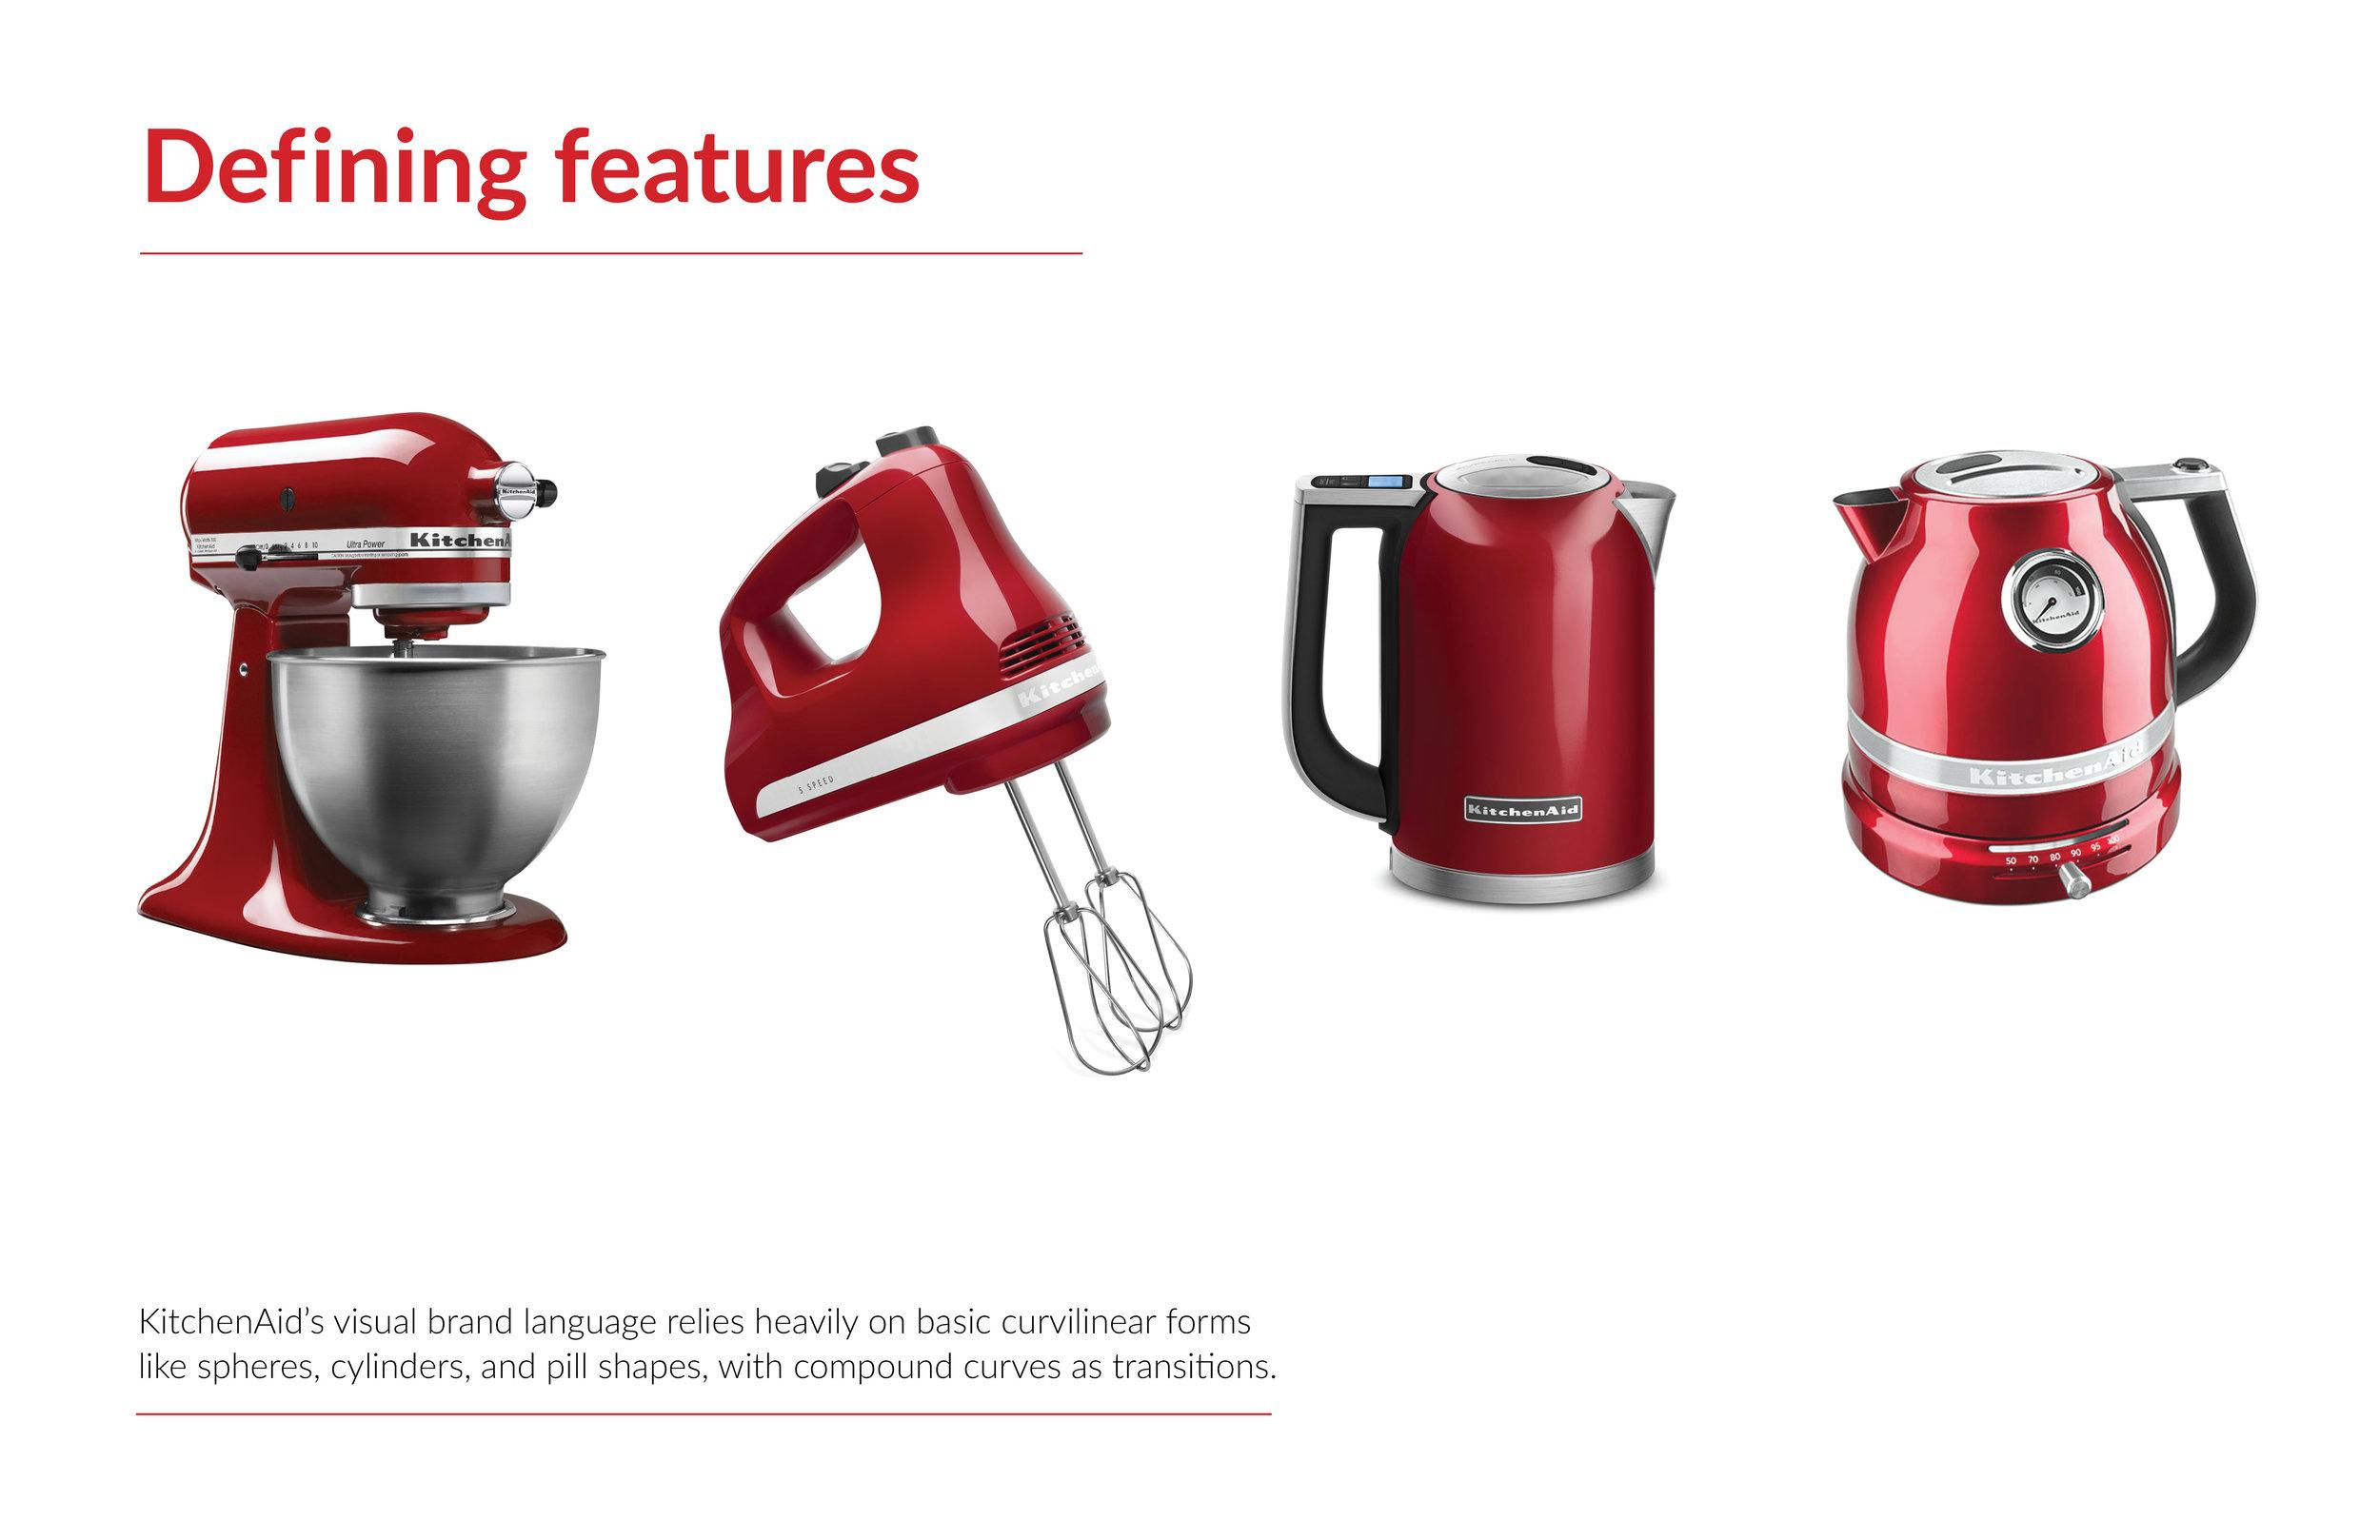 KitchenAid - Style Guide4.jpg